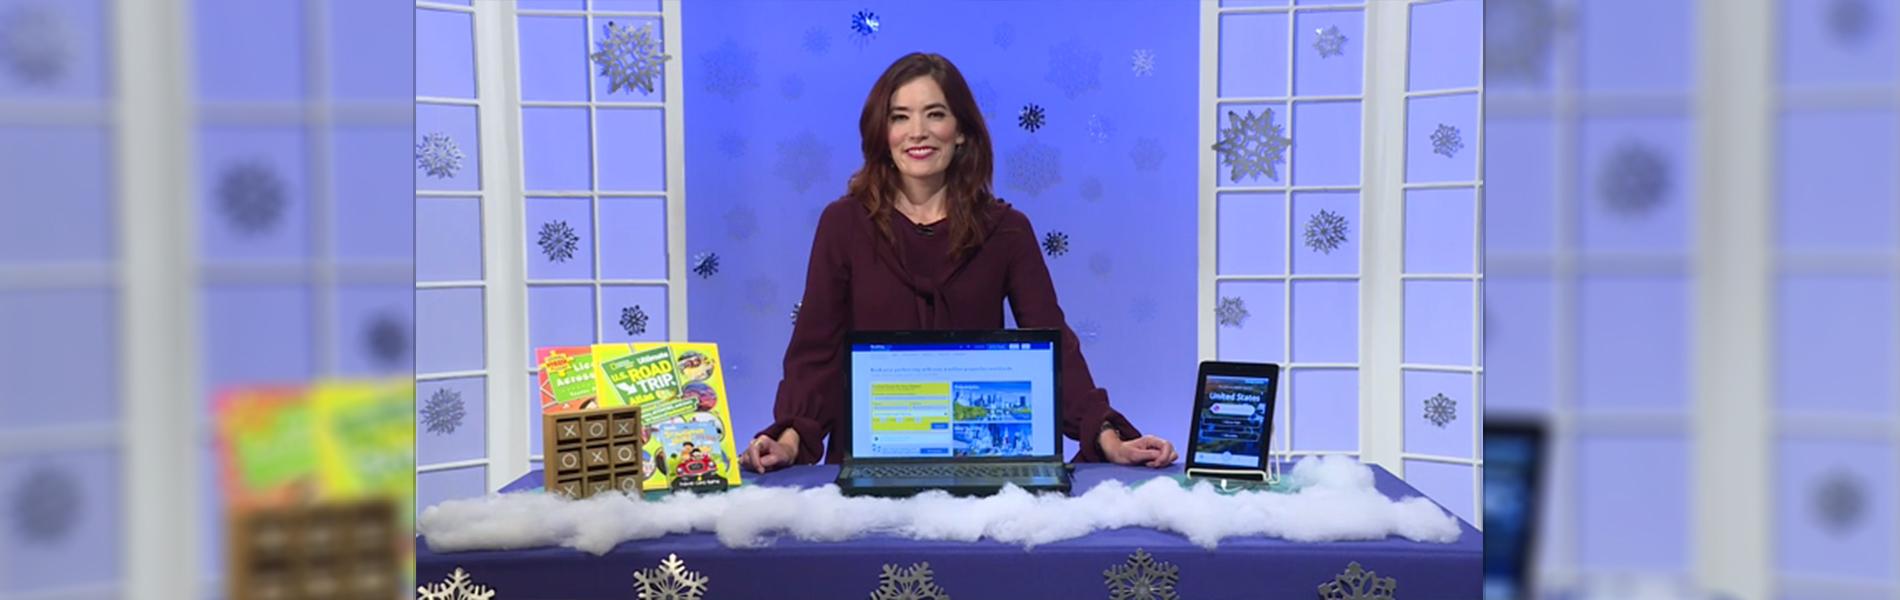 Amy Goodman Holiday Travel Tips